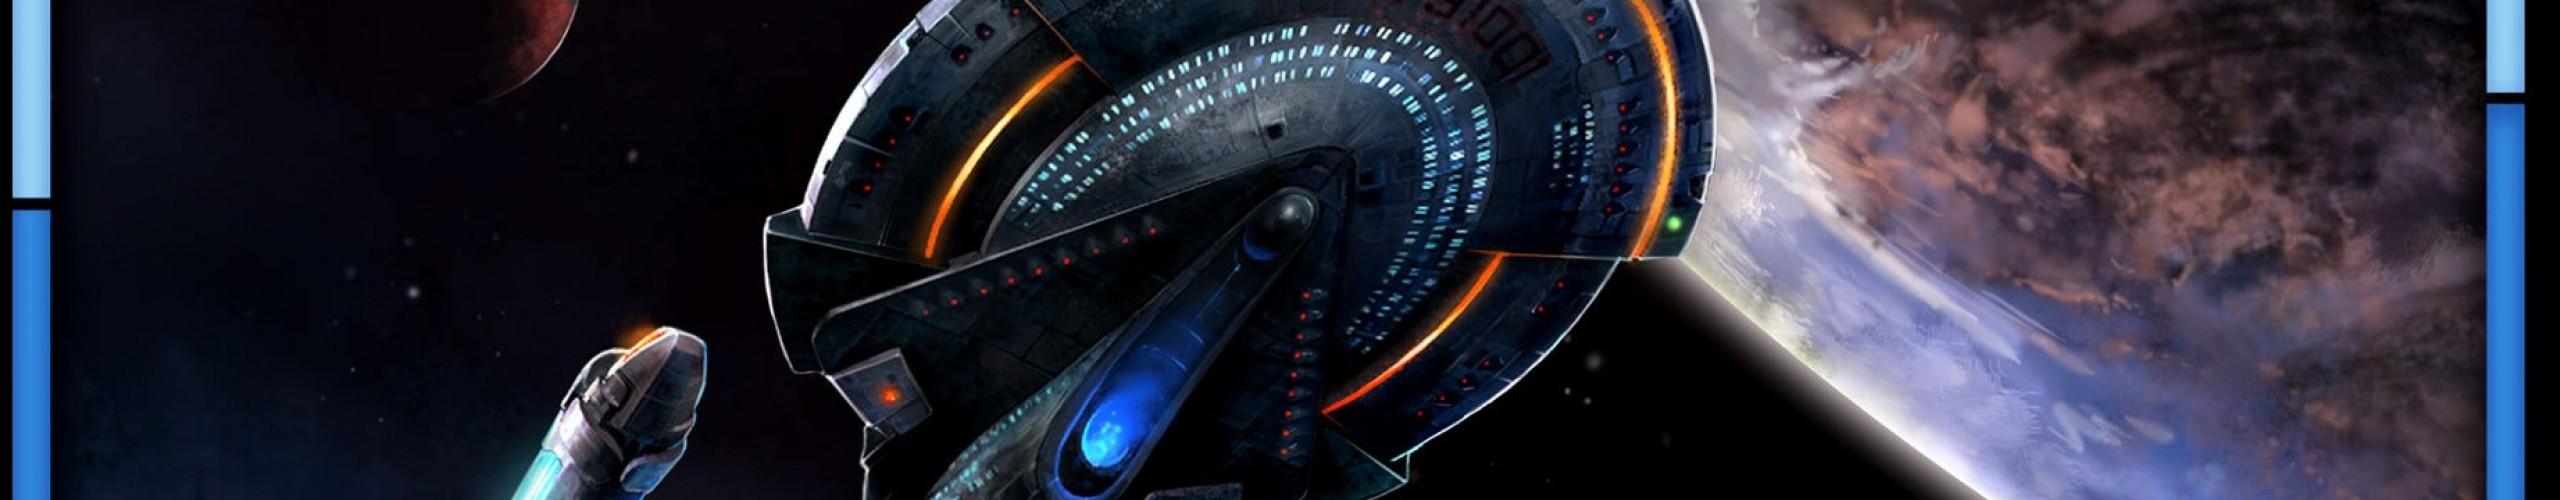 Star Trek En Territoire Alien